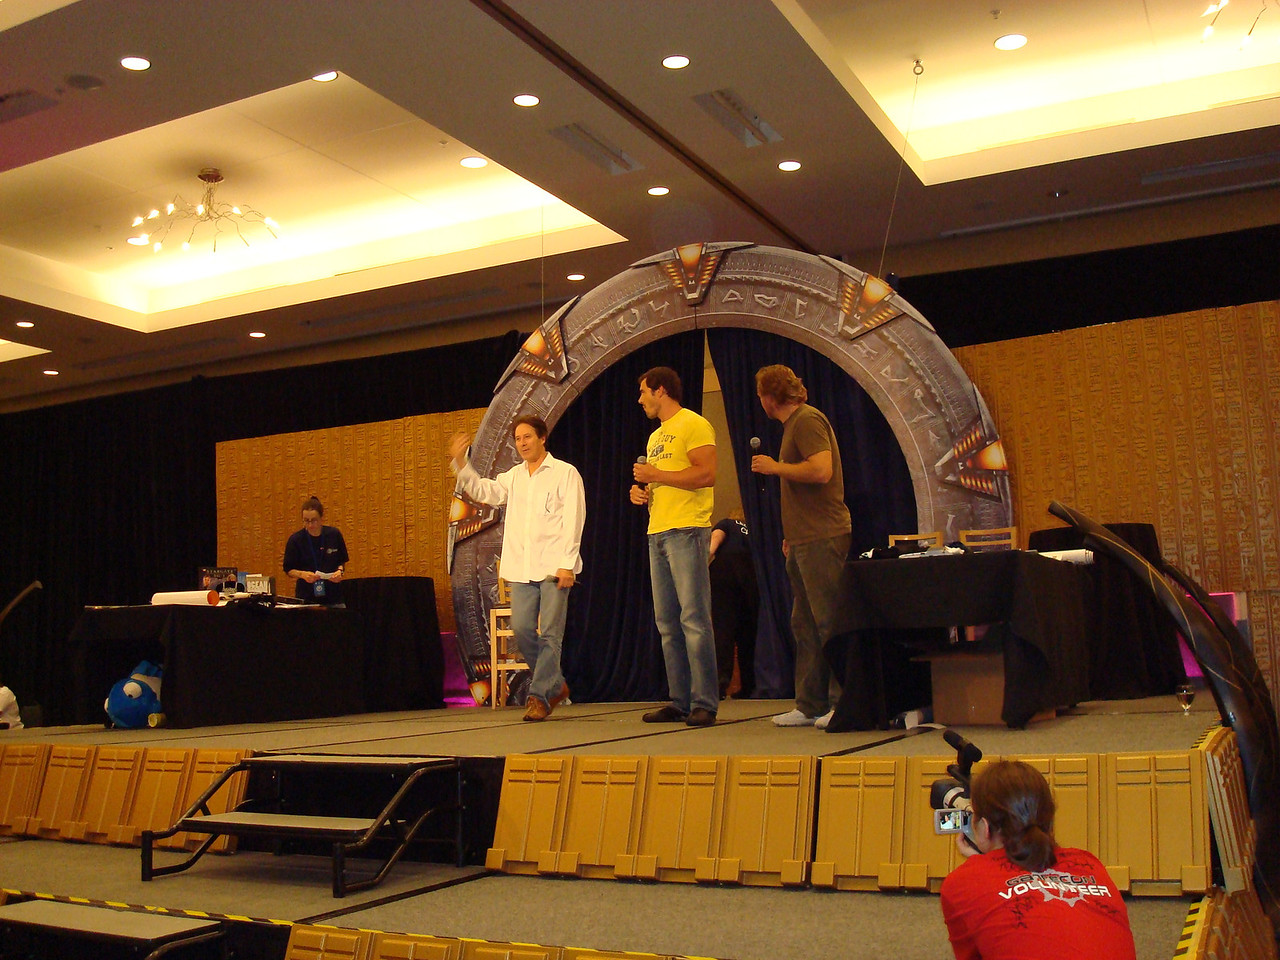 Auction. Garwin Sanford (Narim, Simon Wallis), Dan Payne (Super Soldier, Wraith Warrior), Alex Zahara (a bunch of different Stargate characters)